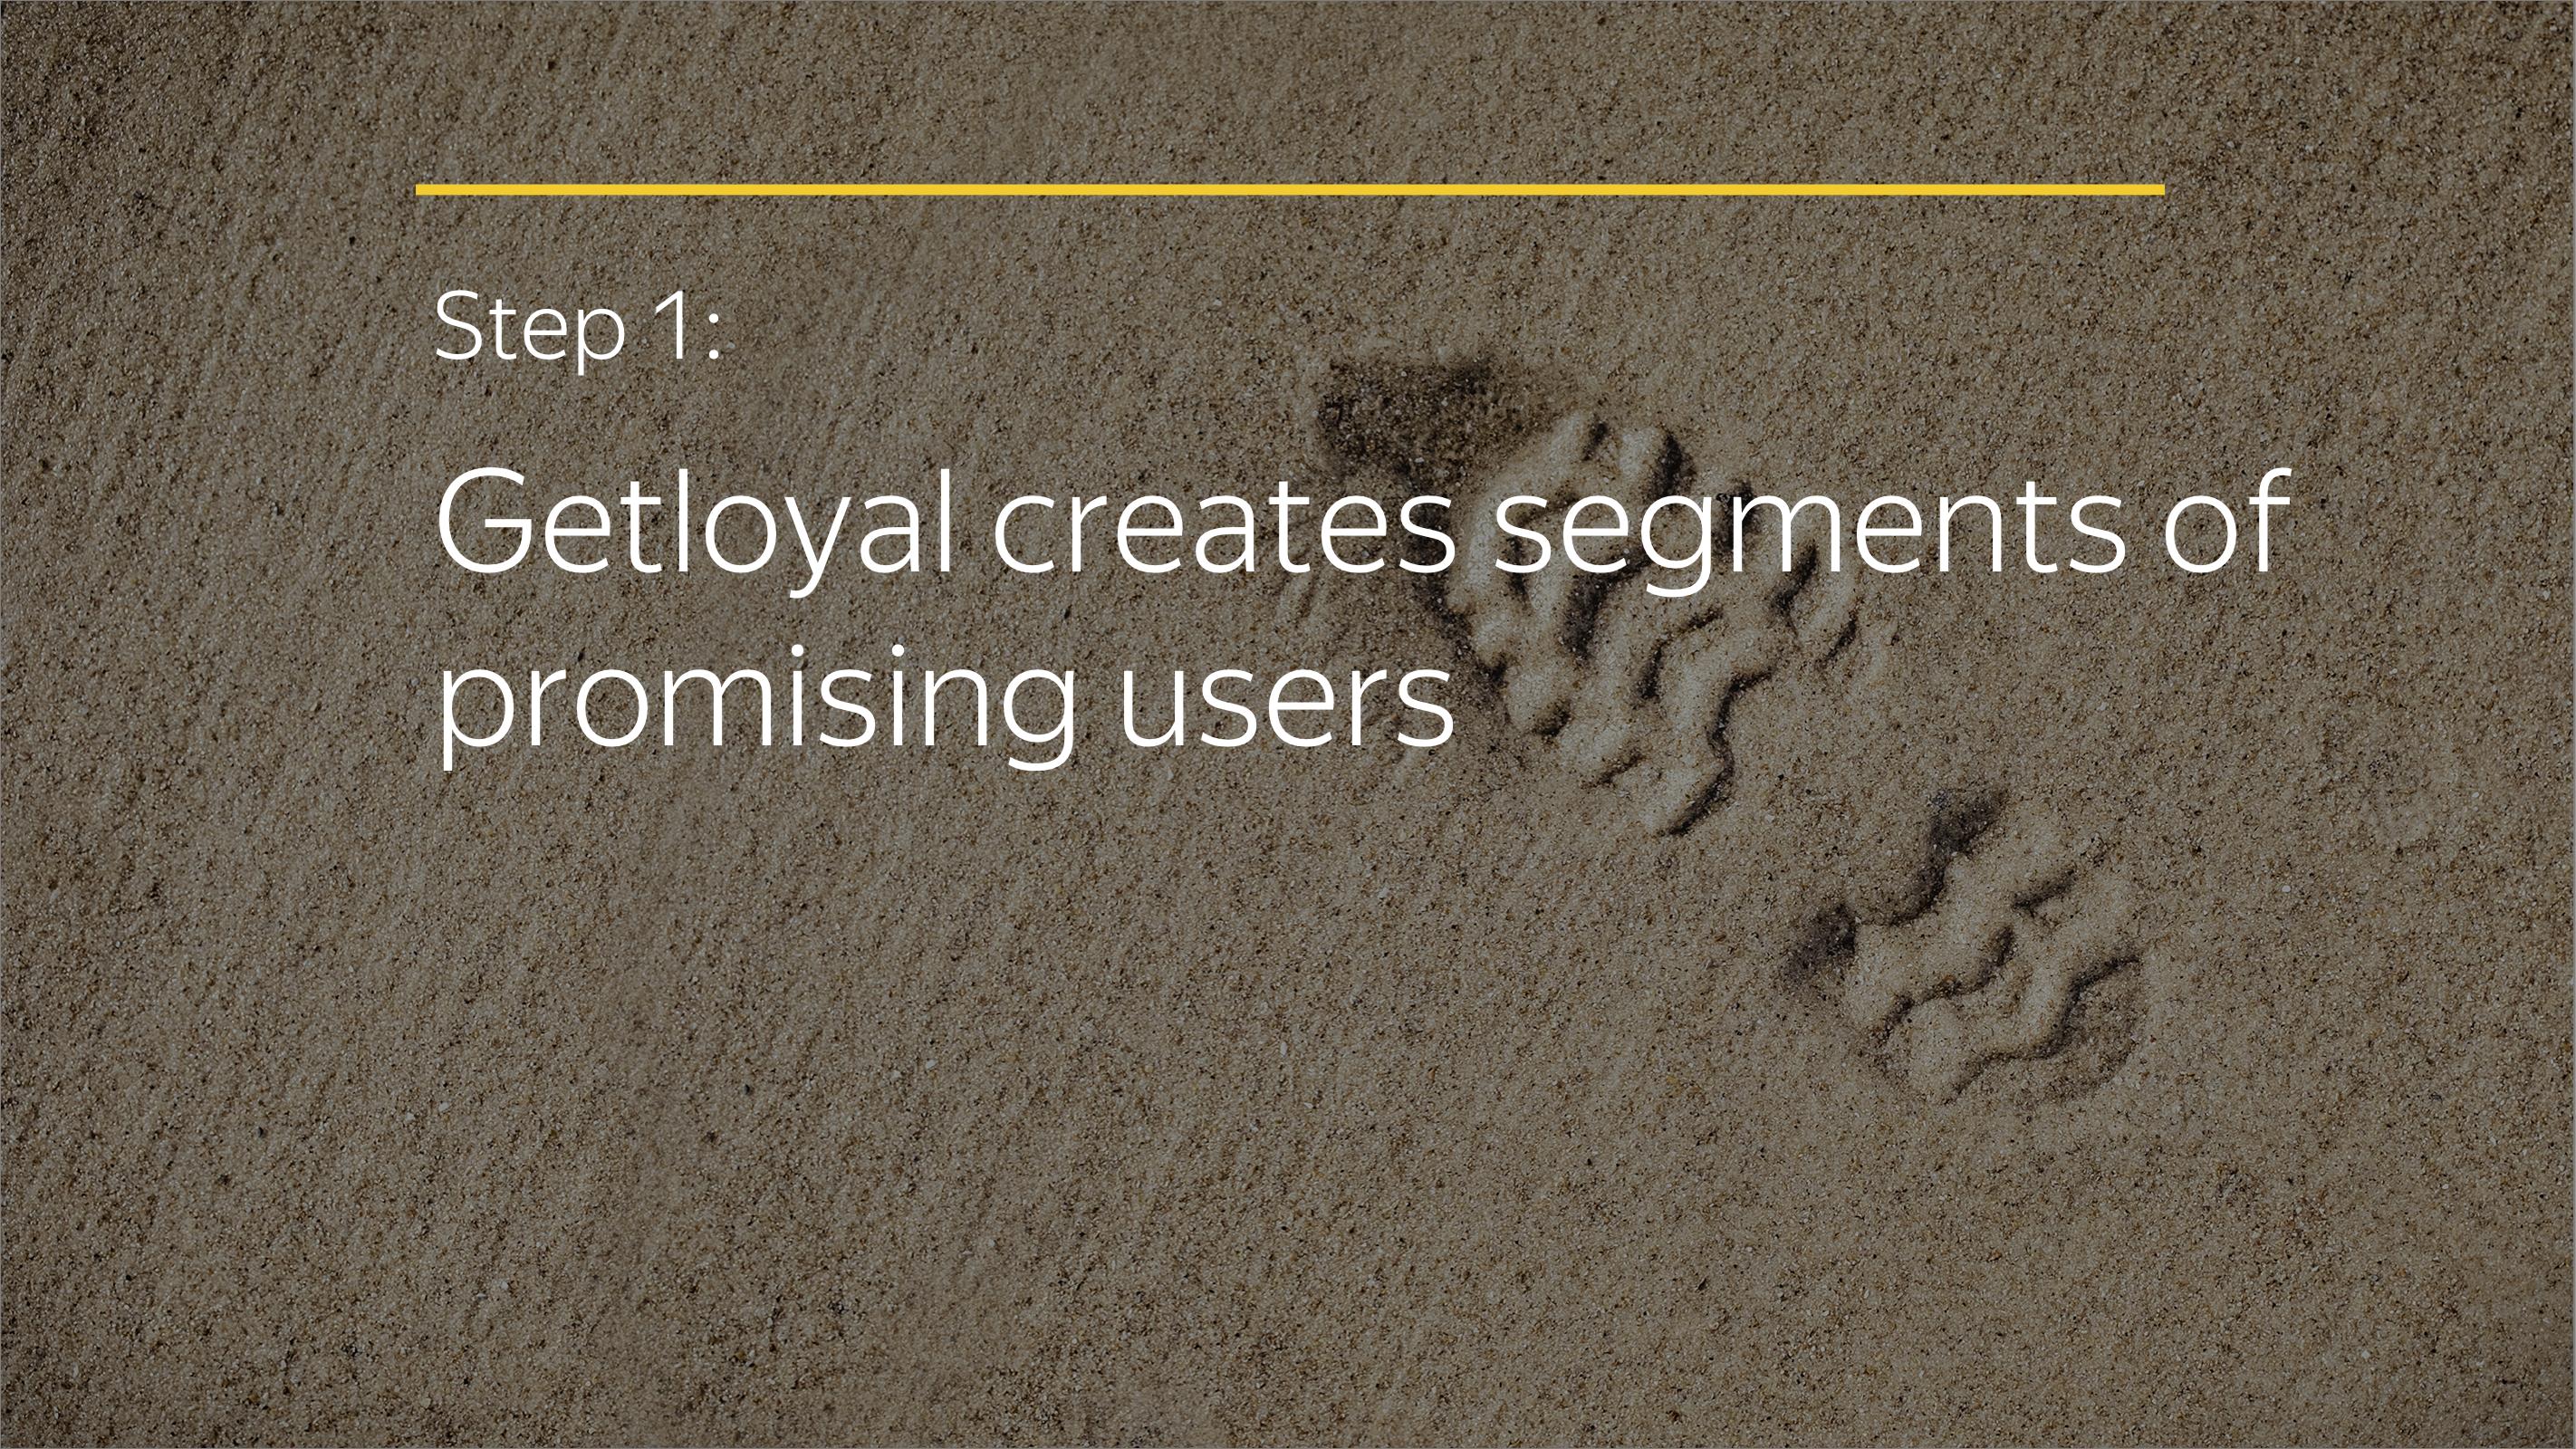 Step 1: Getloyal creates segments of promising users